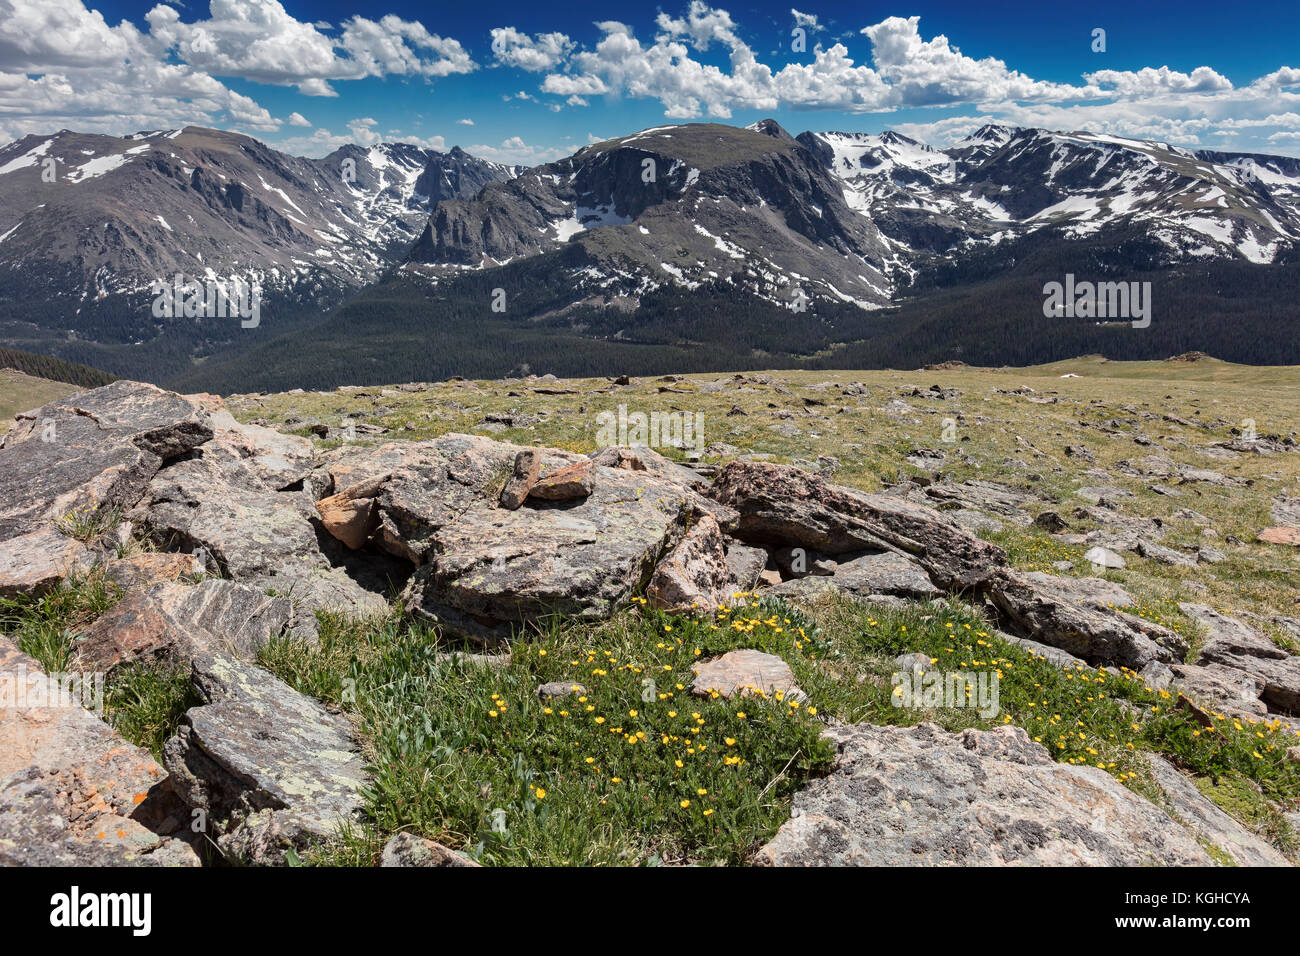 Rocky Mountain National Park, Colorado - Stock Image